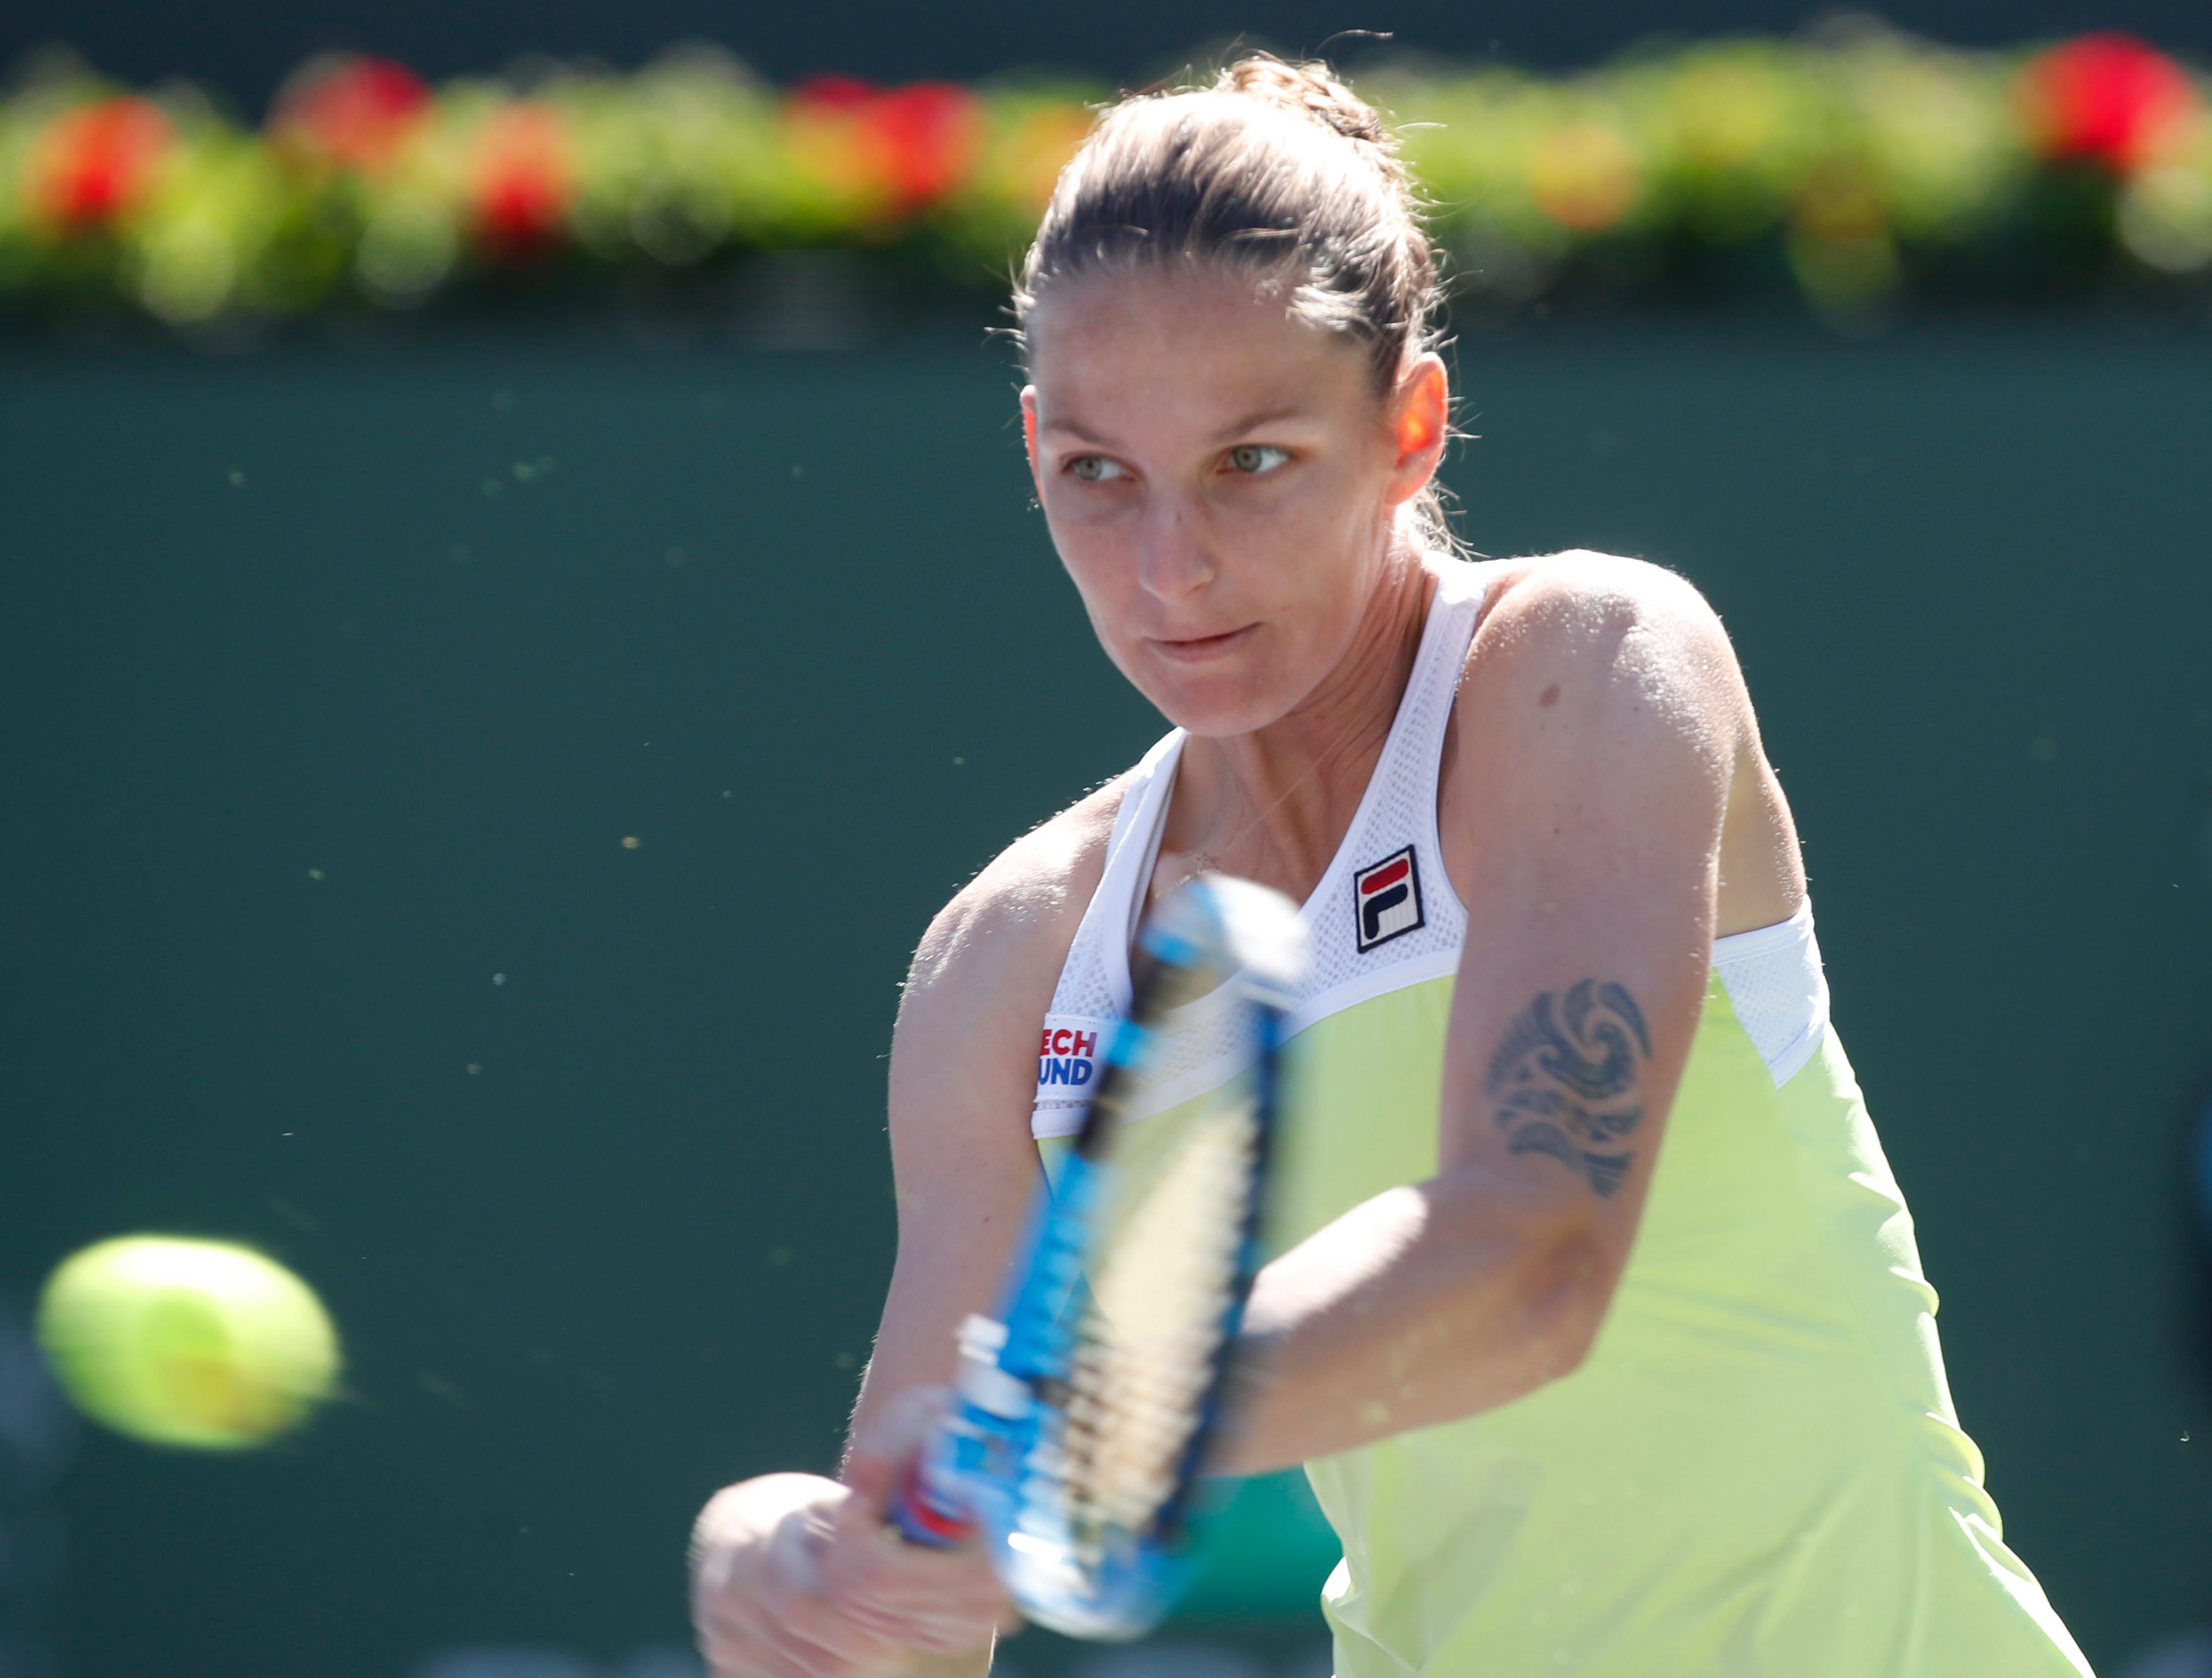 Karolina Pliskova during her game against  Belinda Bencic on Stadium 1 at the 2019 BNP Paribas Open at Indian Wells Tennis Garden on March 12, 2019. Bencic won 6-3, 4-6, 6-3.